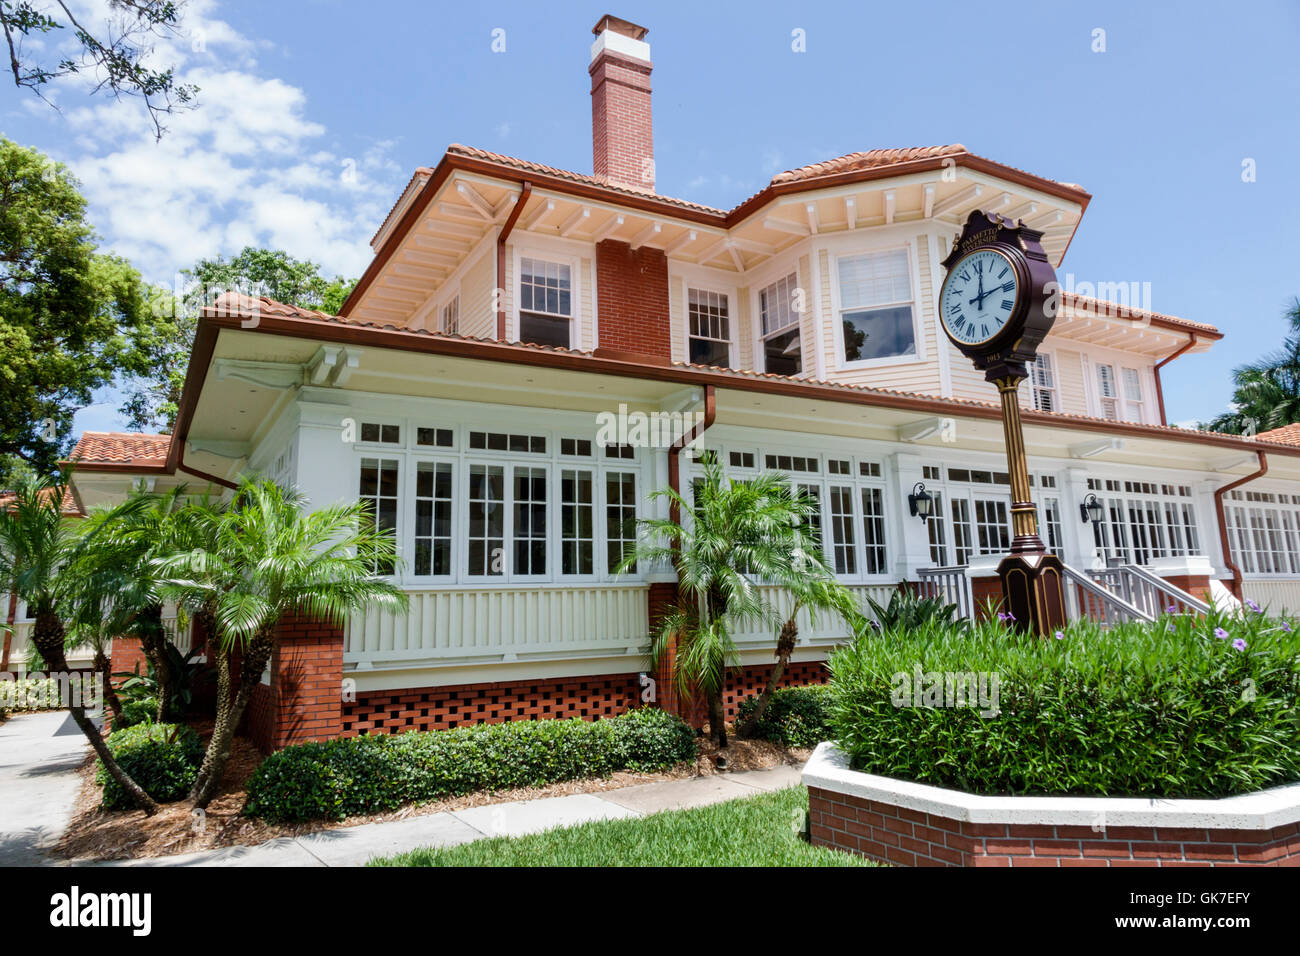 Florida Palmetto Palmetto Riverside Bed and Breakfast Haus Kulturdenkmal 1913 Gästehaus außen Garten Sears Stockbild